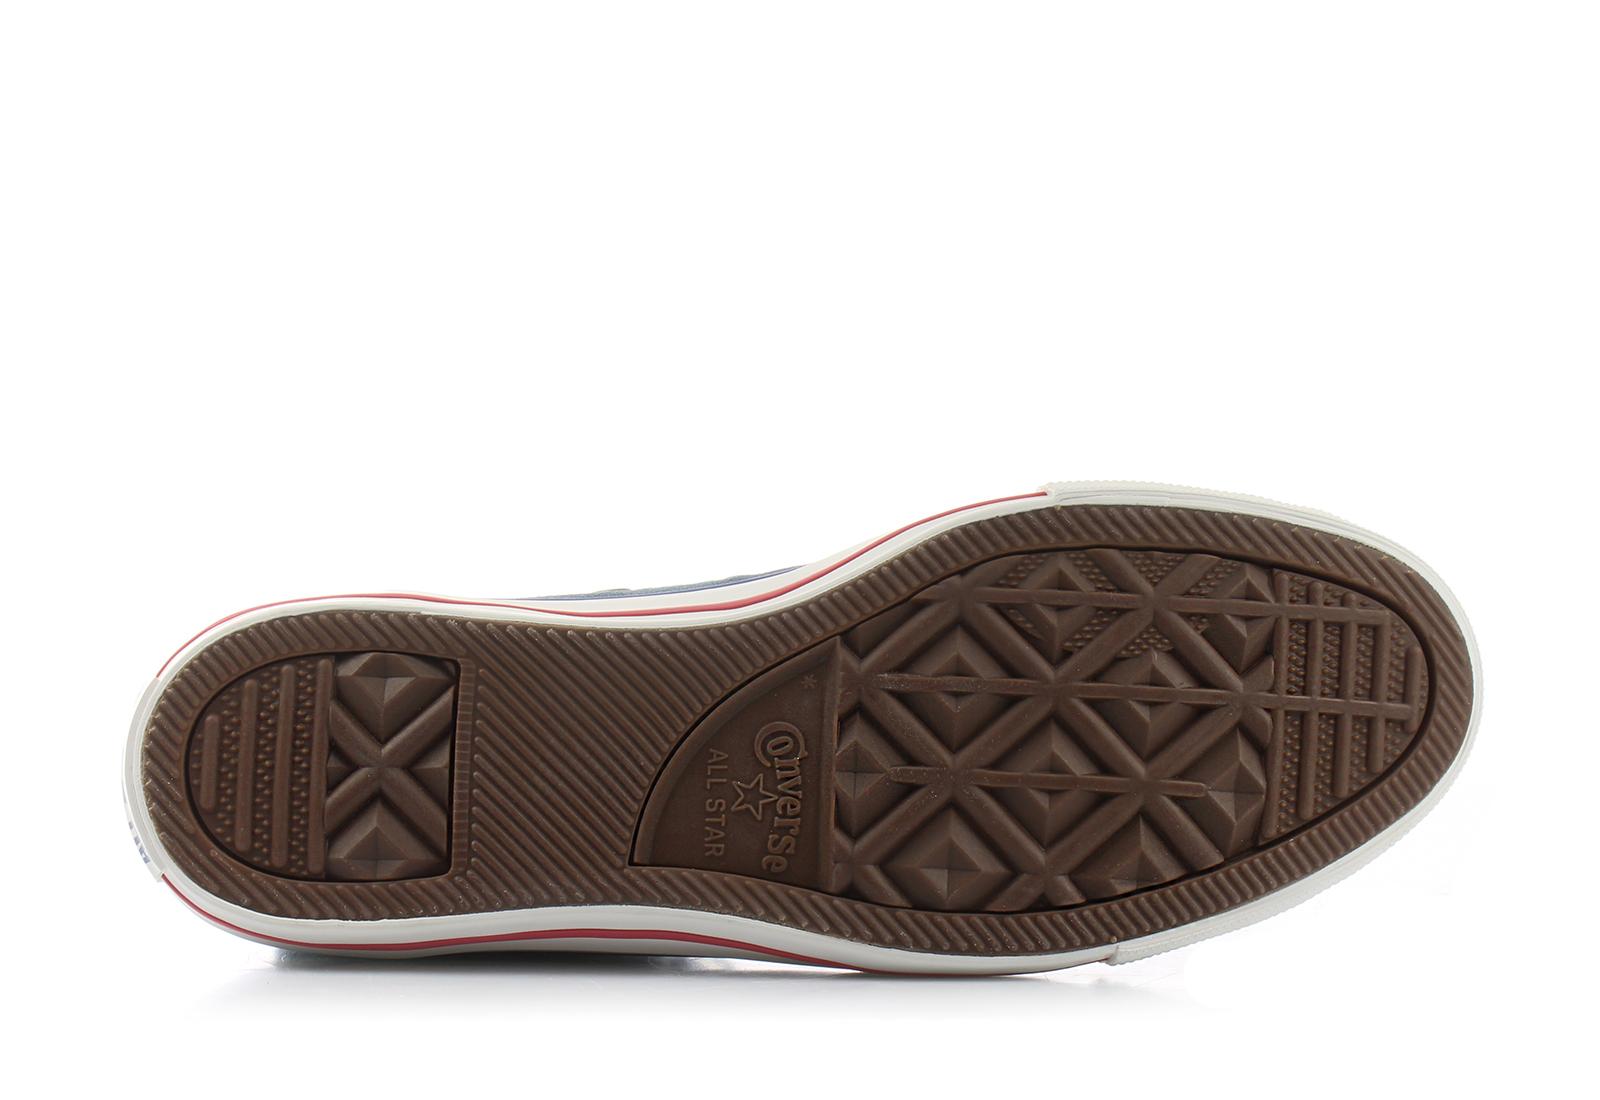 Converse Sneakers - Chuck Taylor All Star Sun Bleach Hi - 160954C ... aeabed44542